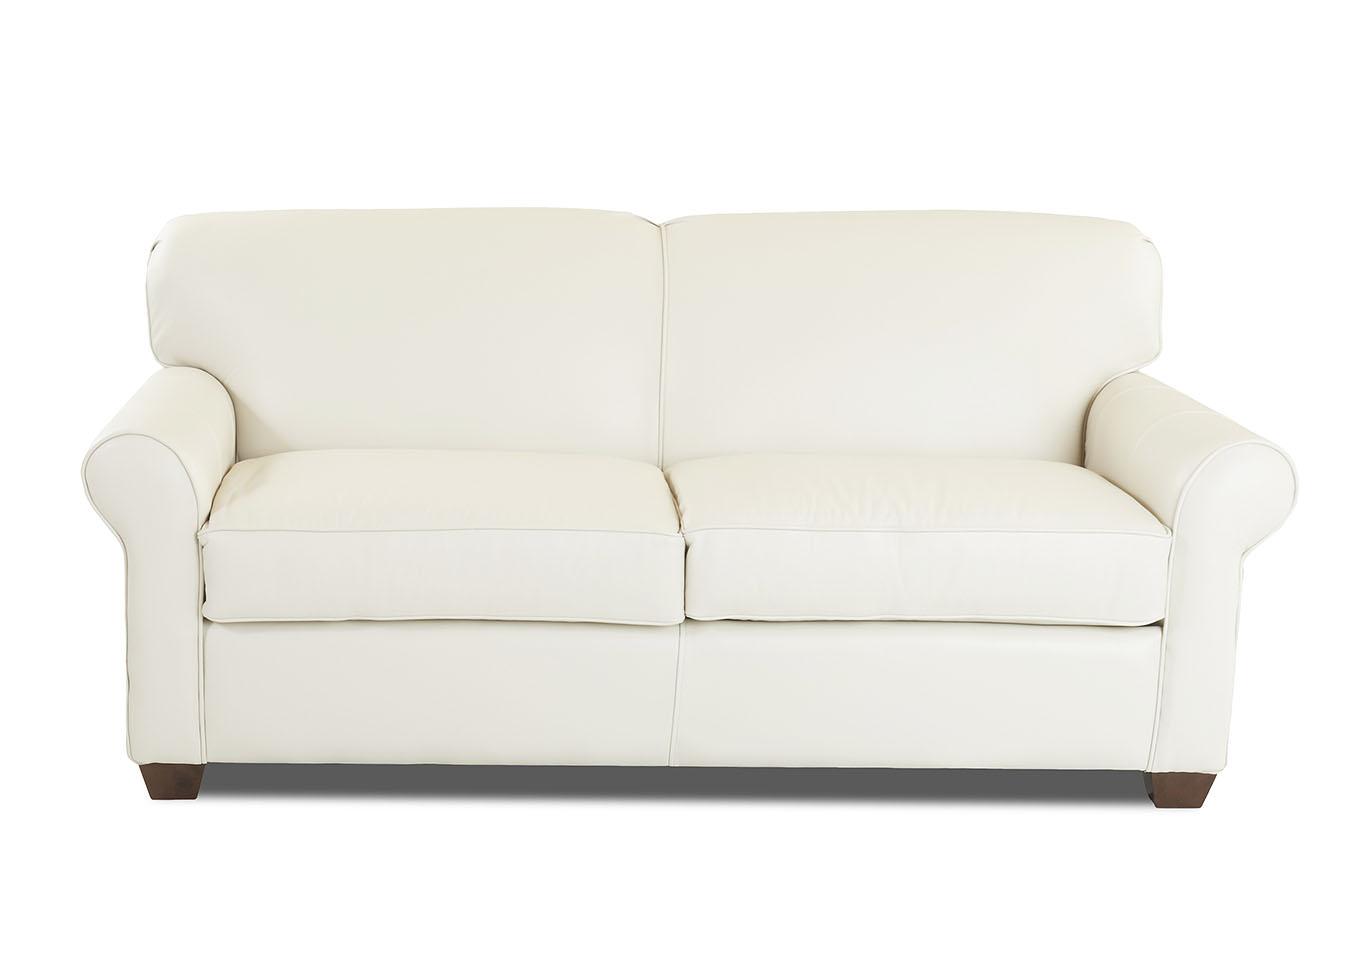 Mayhew White Leather Sleeper Sofa,Klaussner Home Furnishings